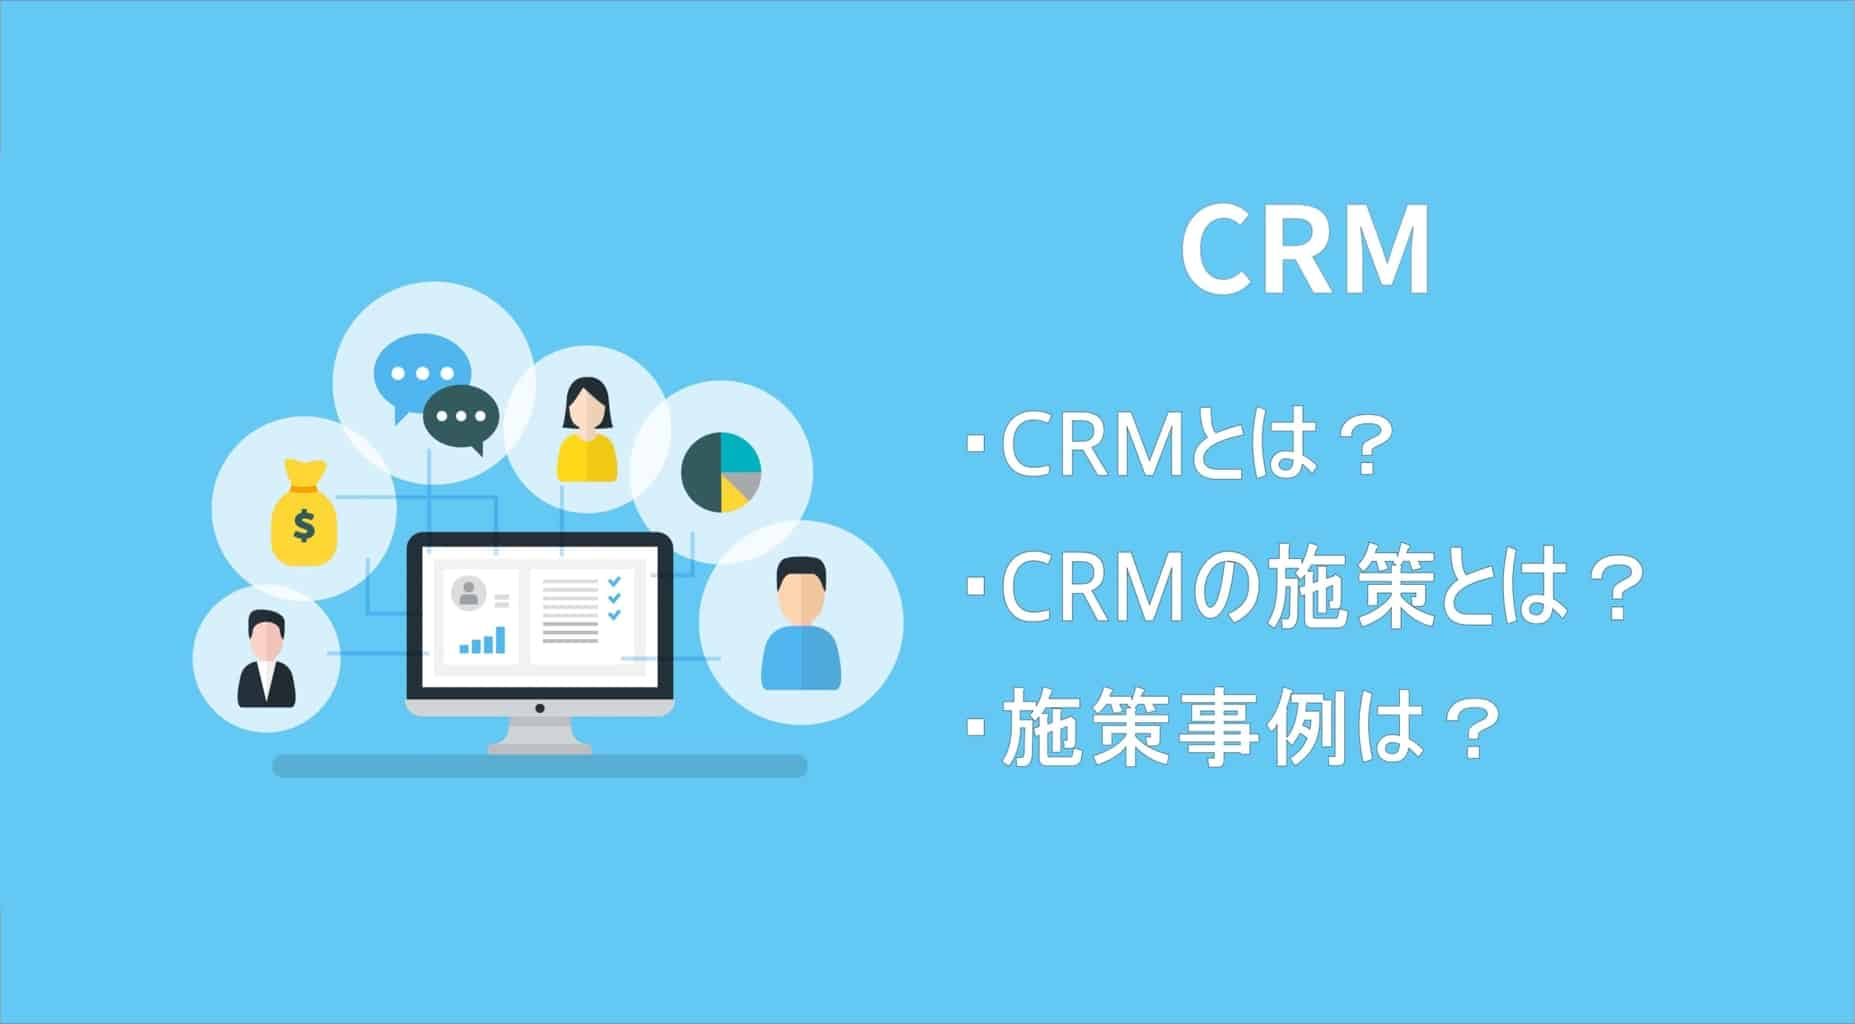 CRMを活用した施策とは?施策事例も紹介!